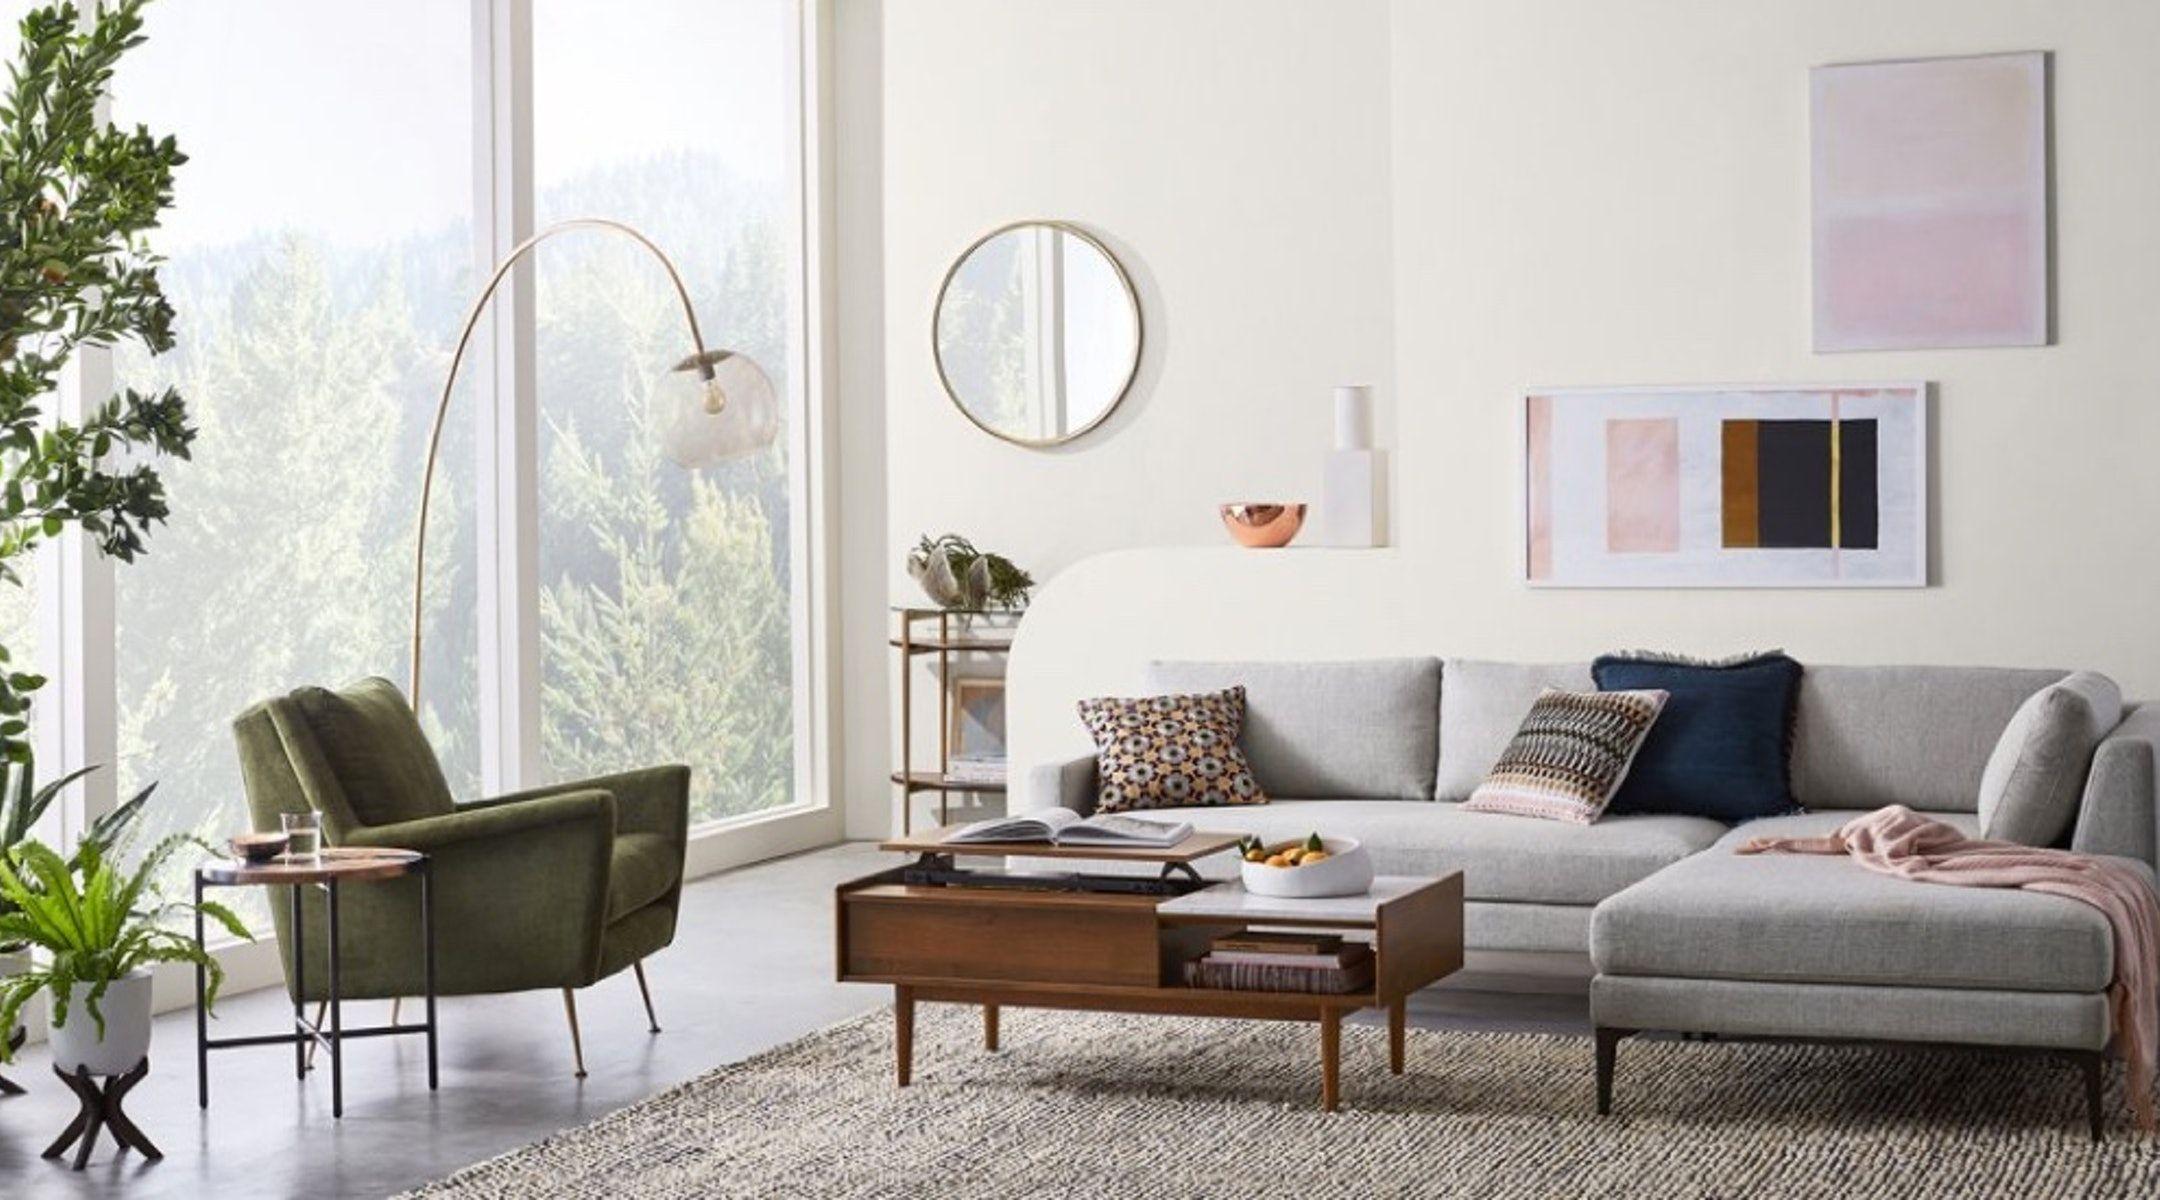 Jute Boucle Rug Platinum 5x8 Home Decor Interior Decor